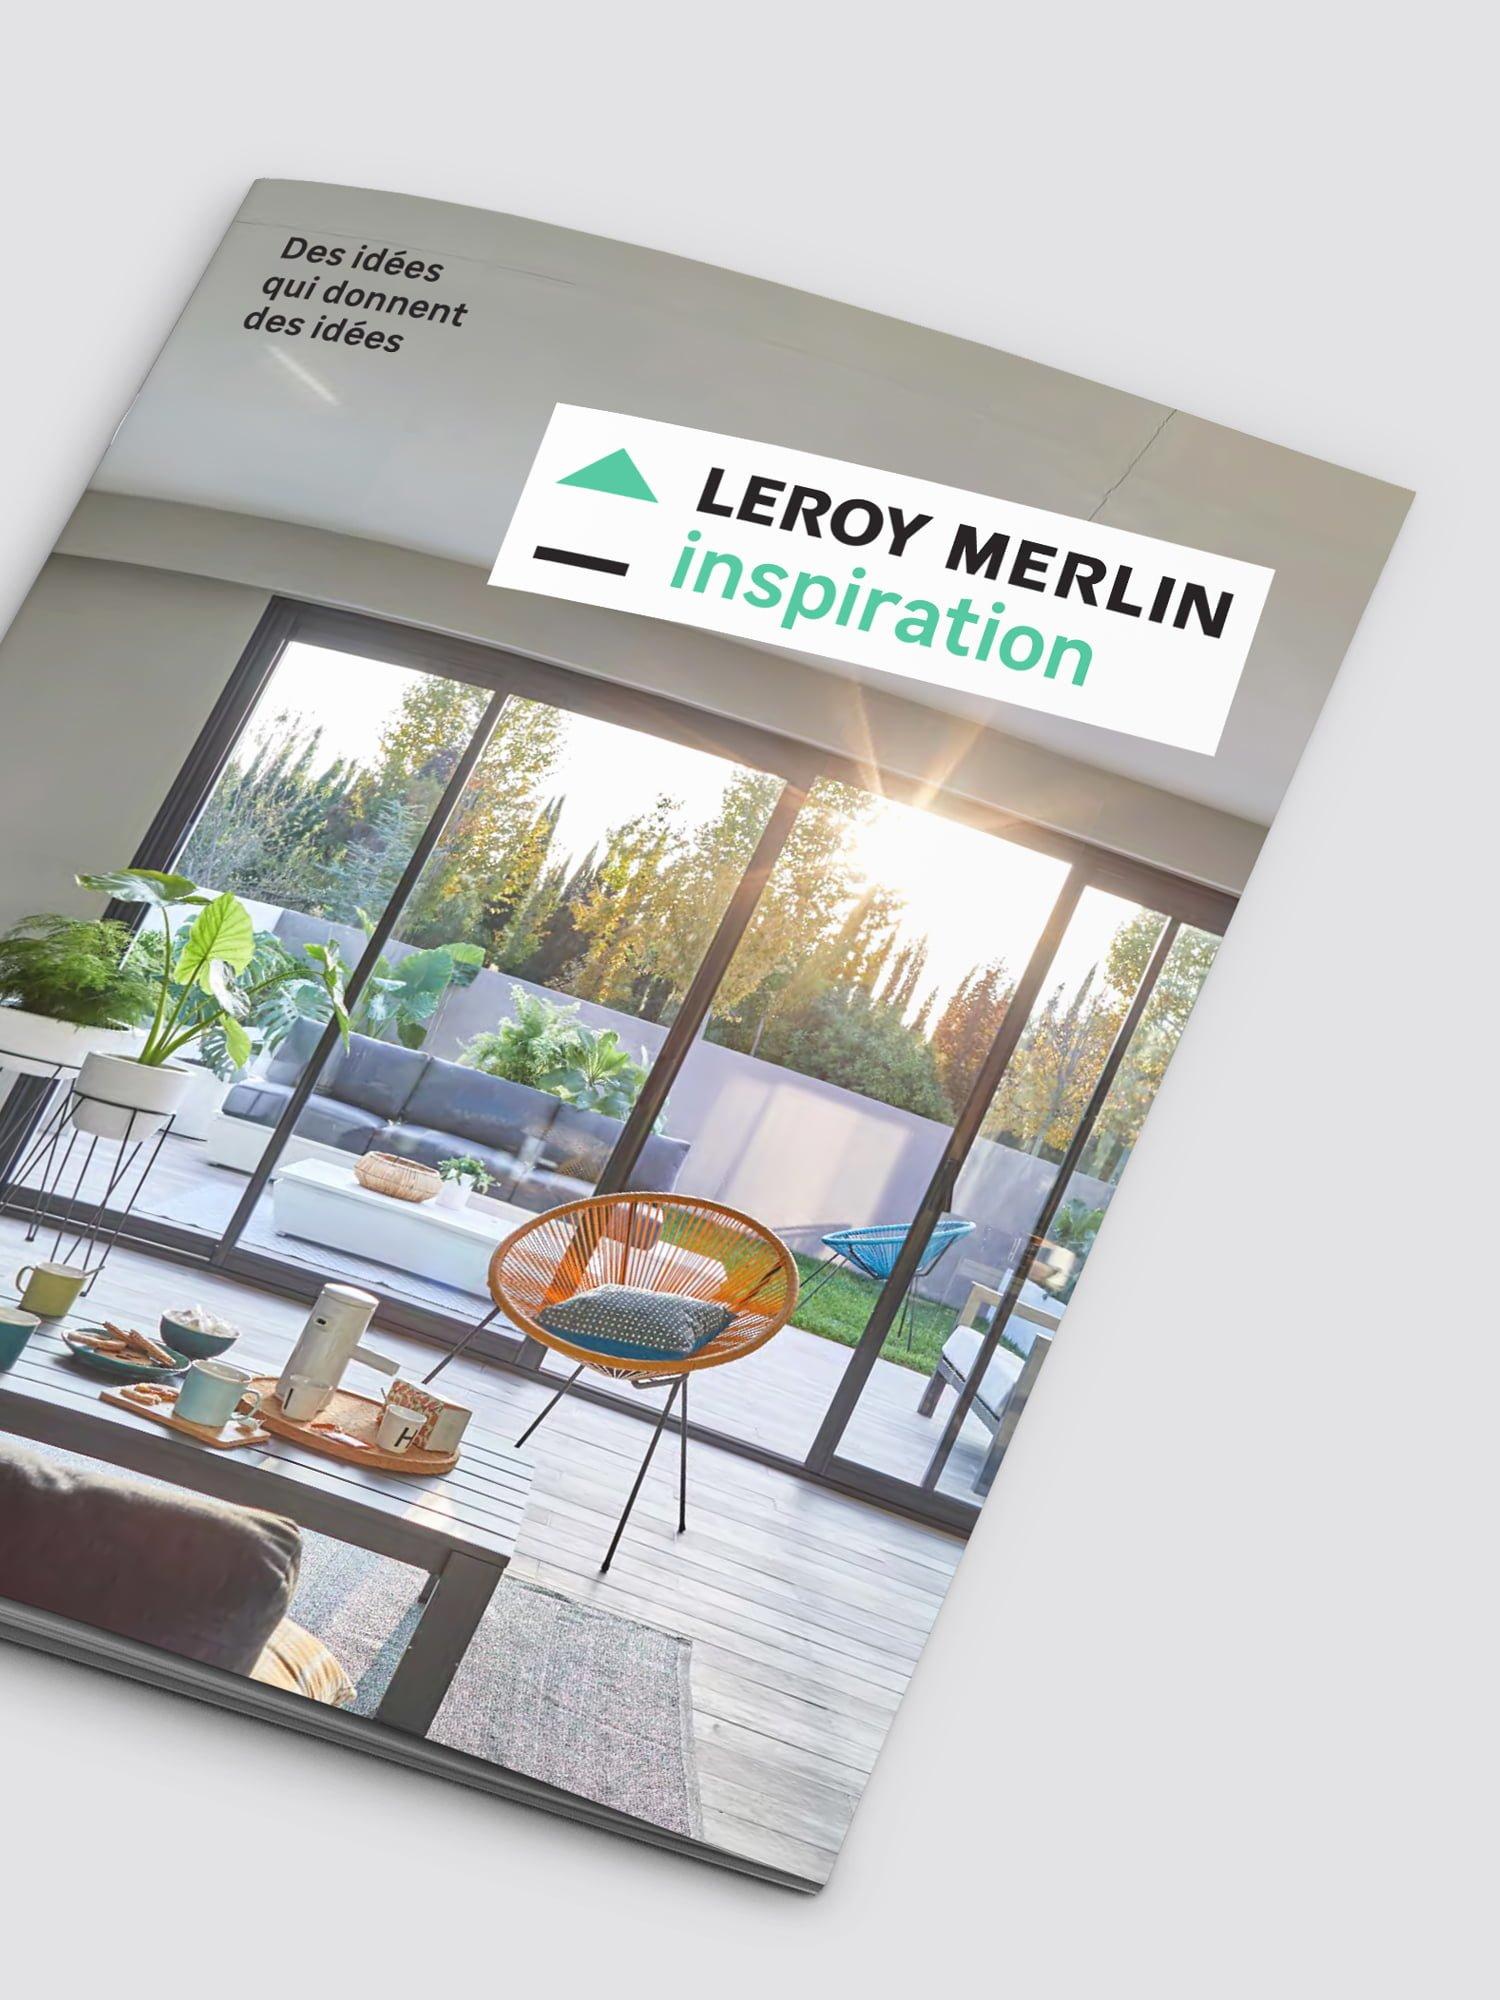 Leroy Merlin,aurelie bert,guide,design graphique,communication graphique,agence ici barbes,magazine